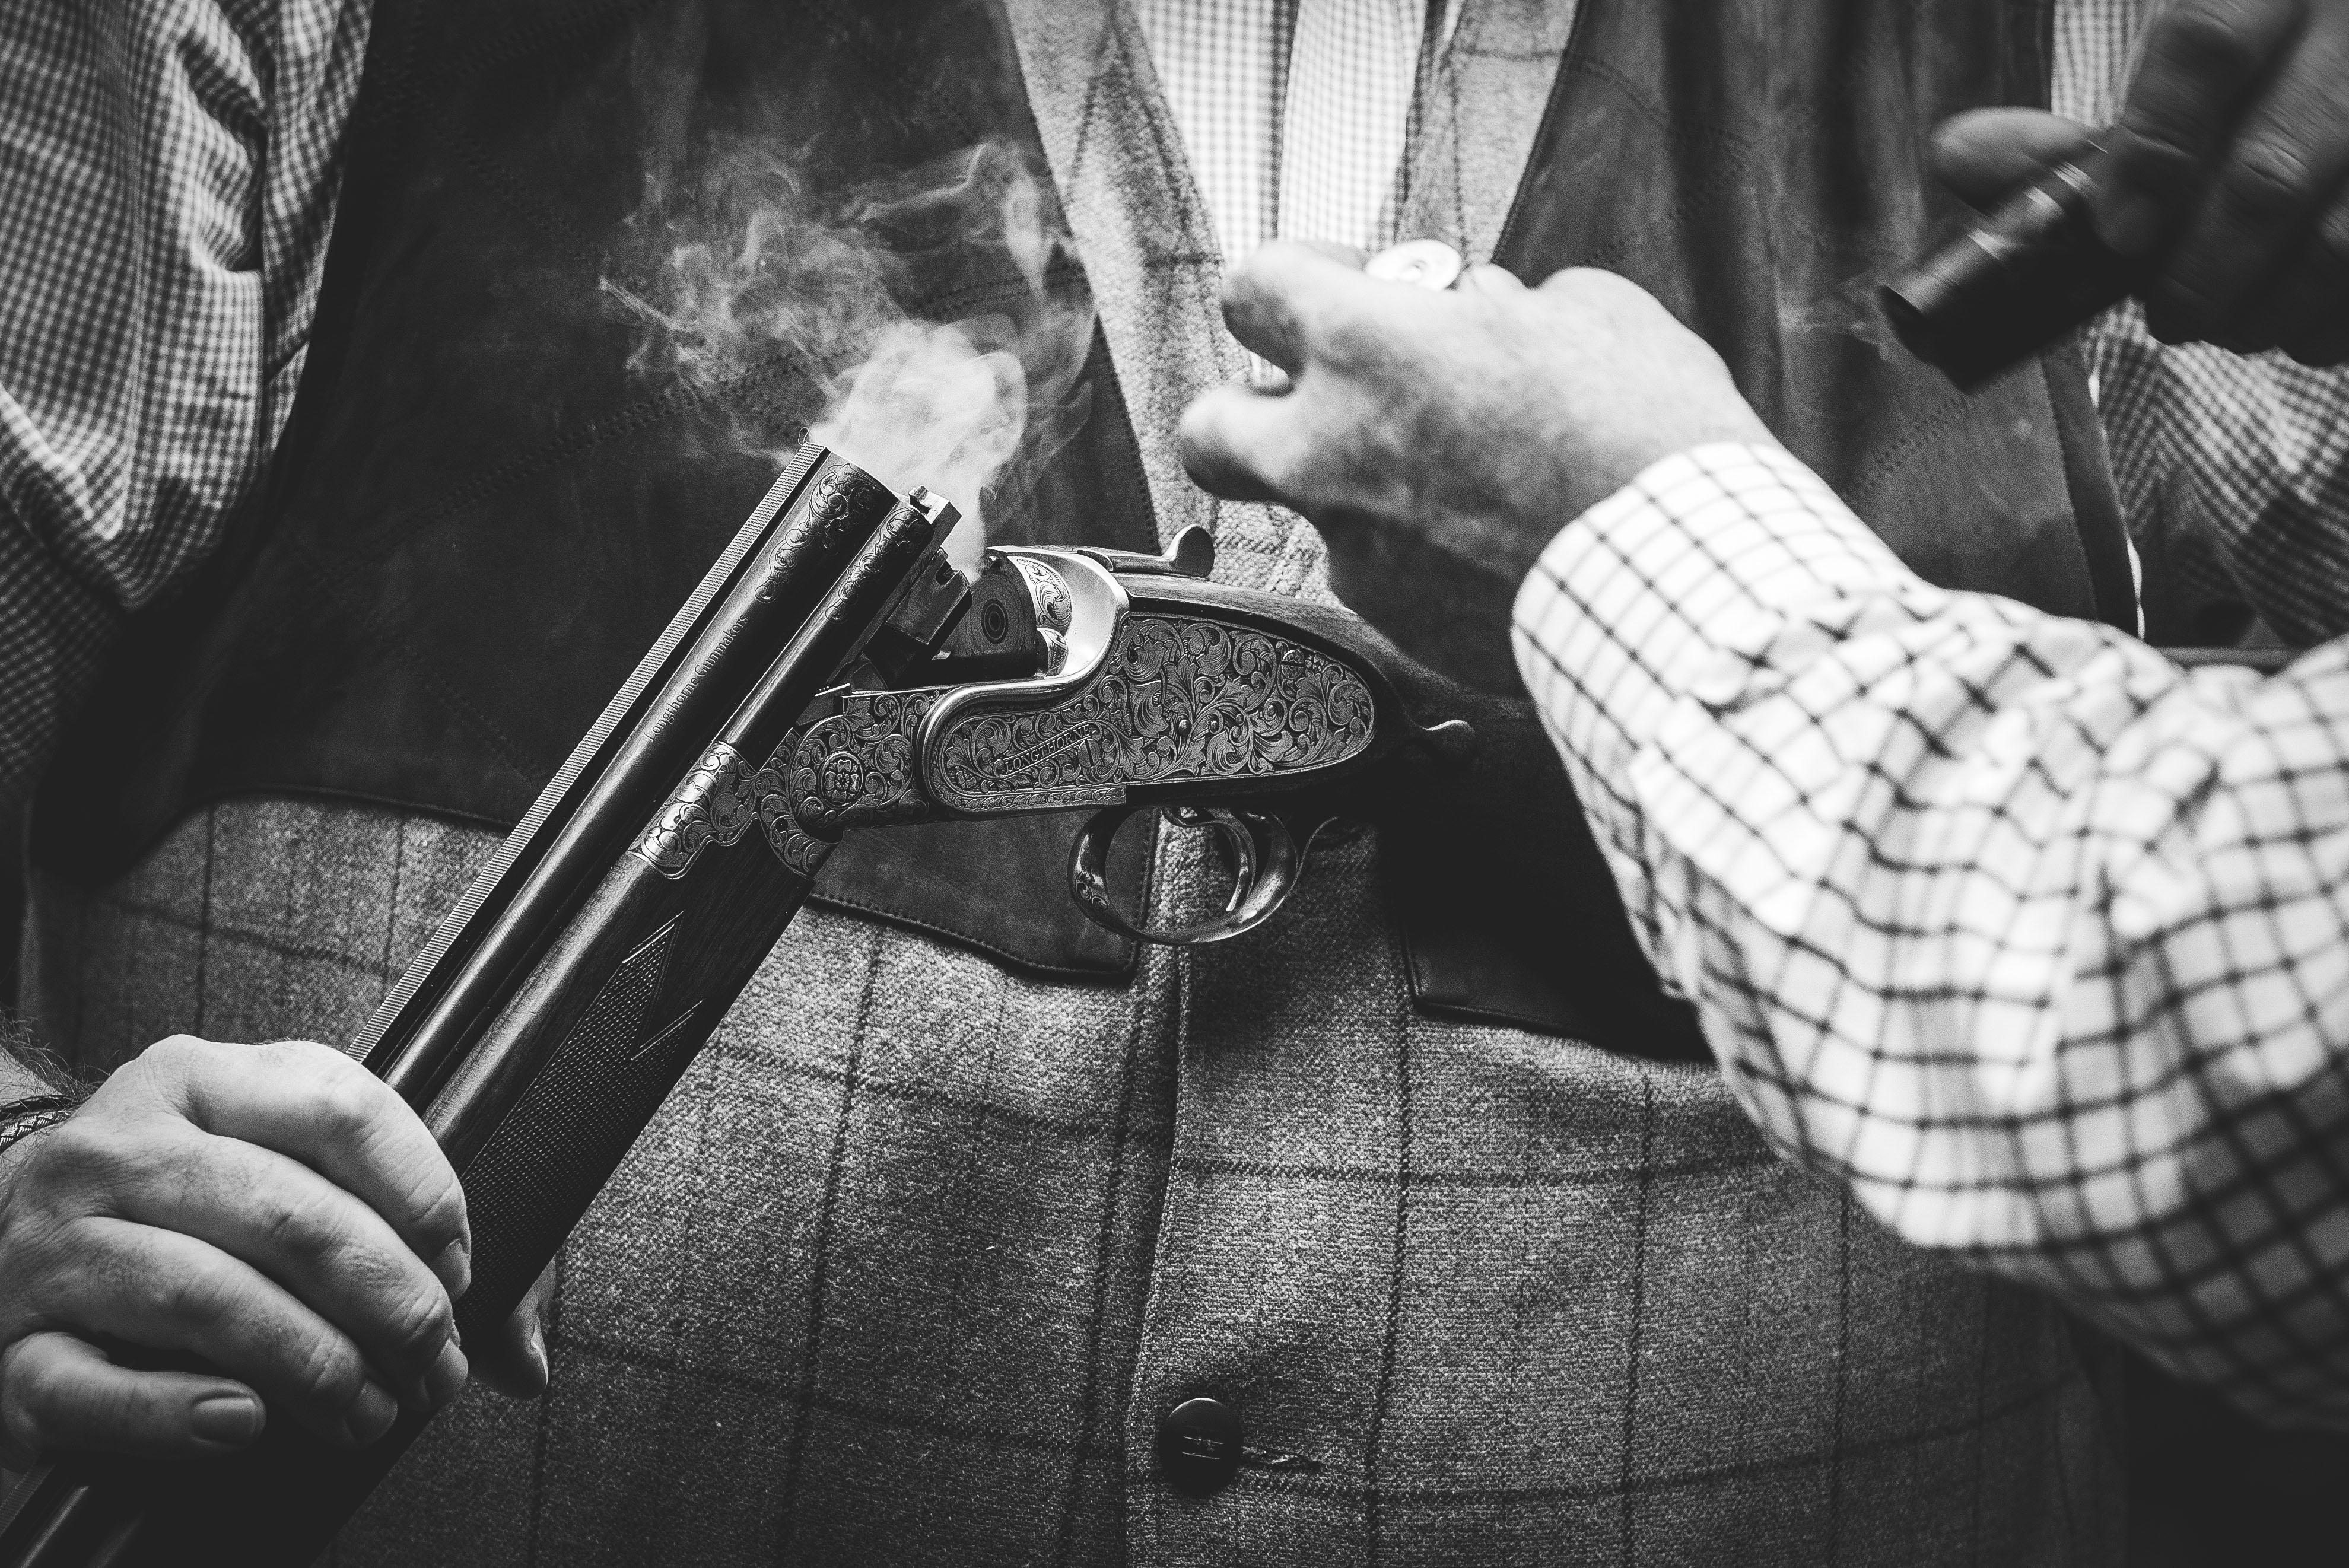 A close up of a man holding a smoking shotgun